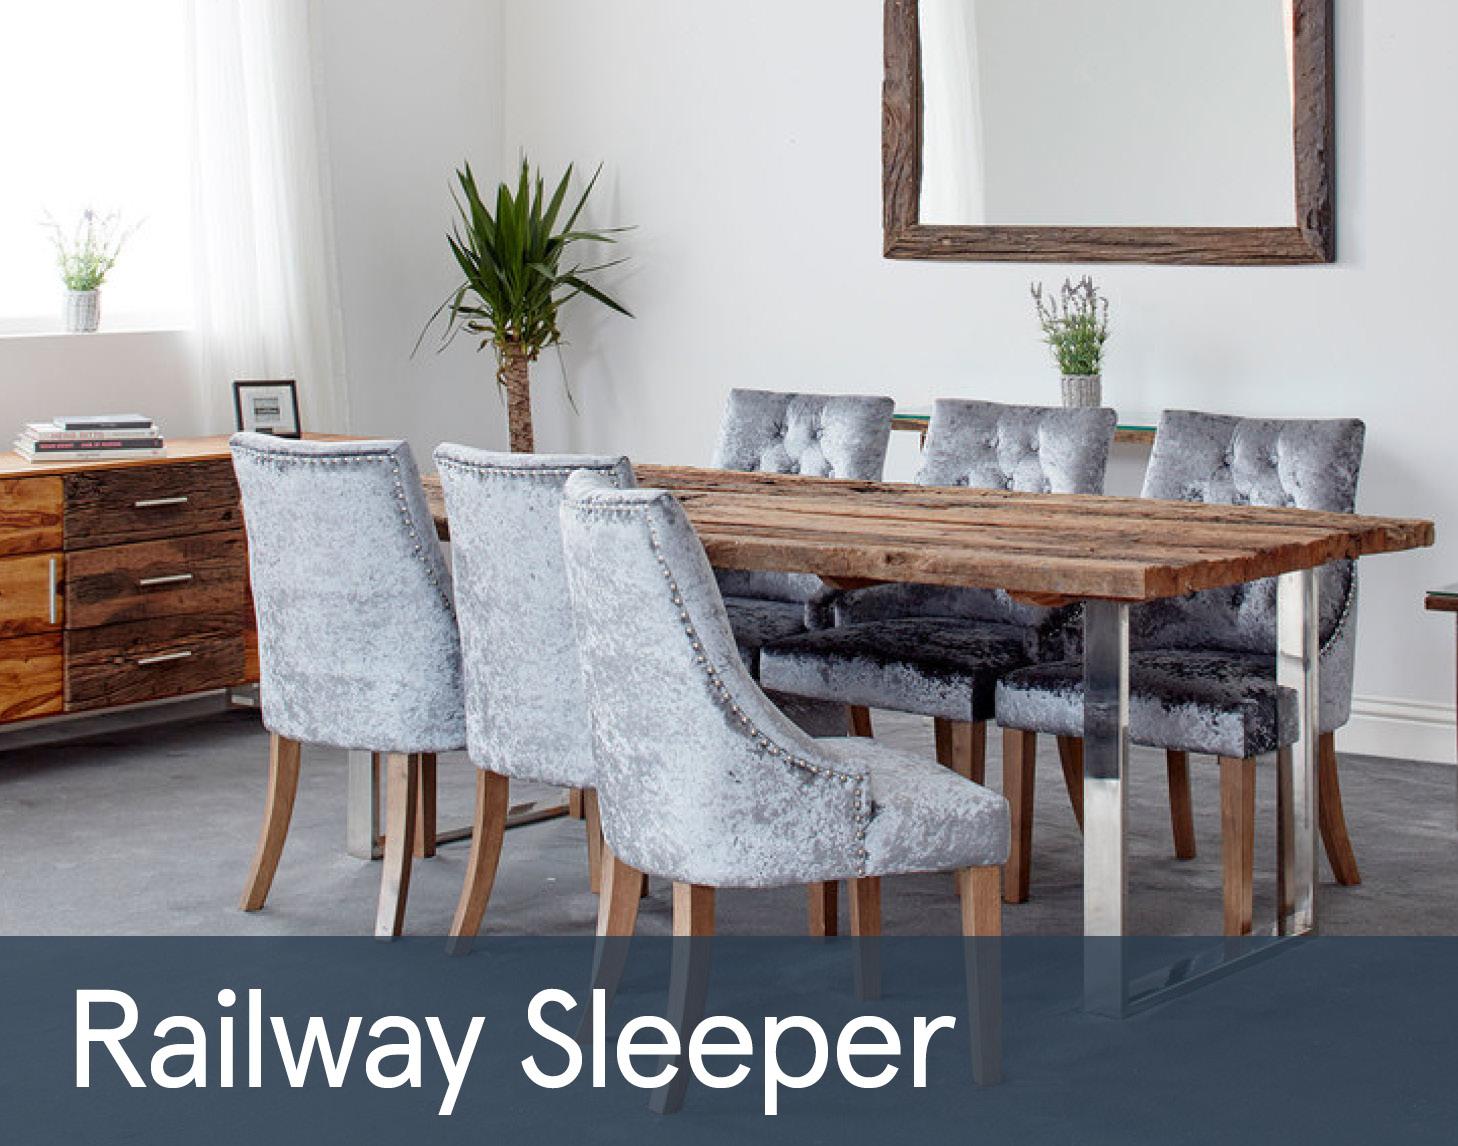 Railway Sleeper